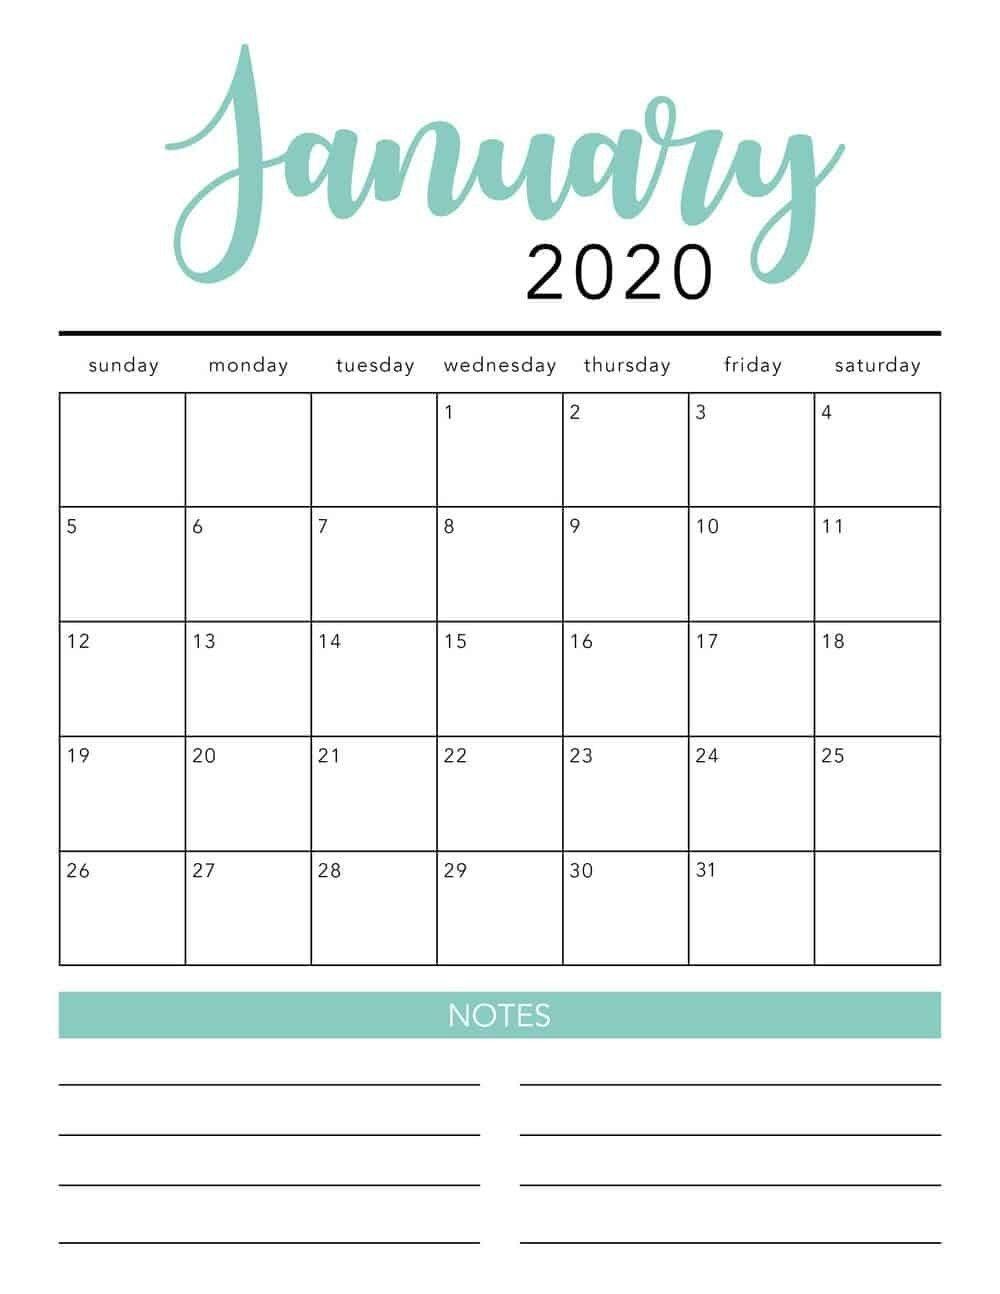 Free 2020 Monthly Calendar Printable | Free Printable  Free Printable Calendars 2020 Monthly